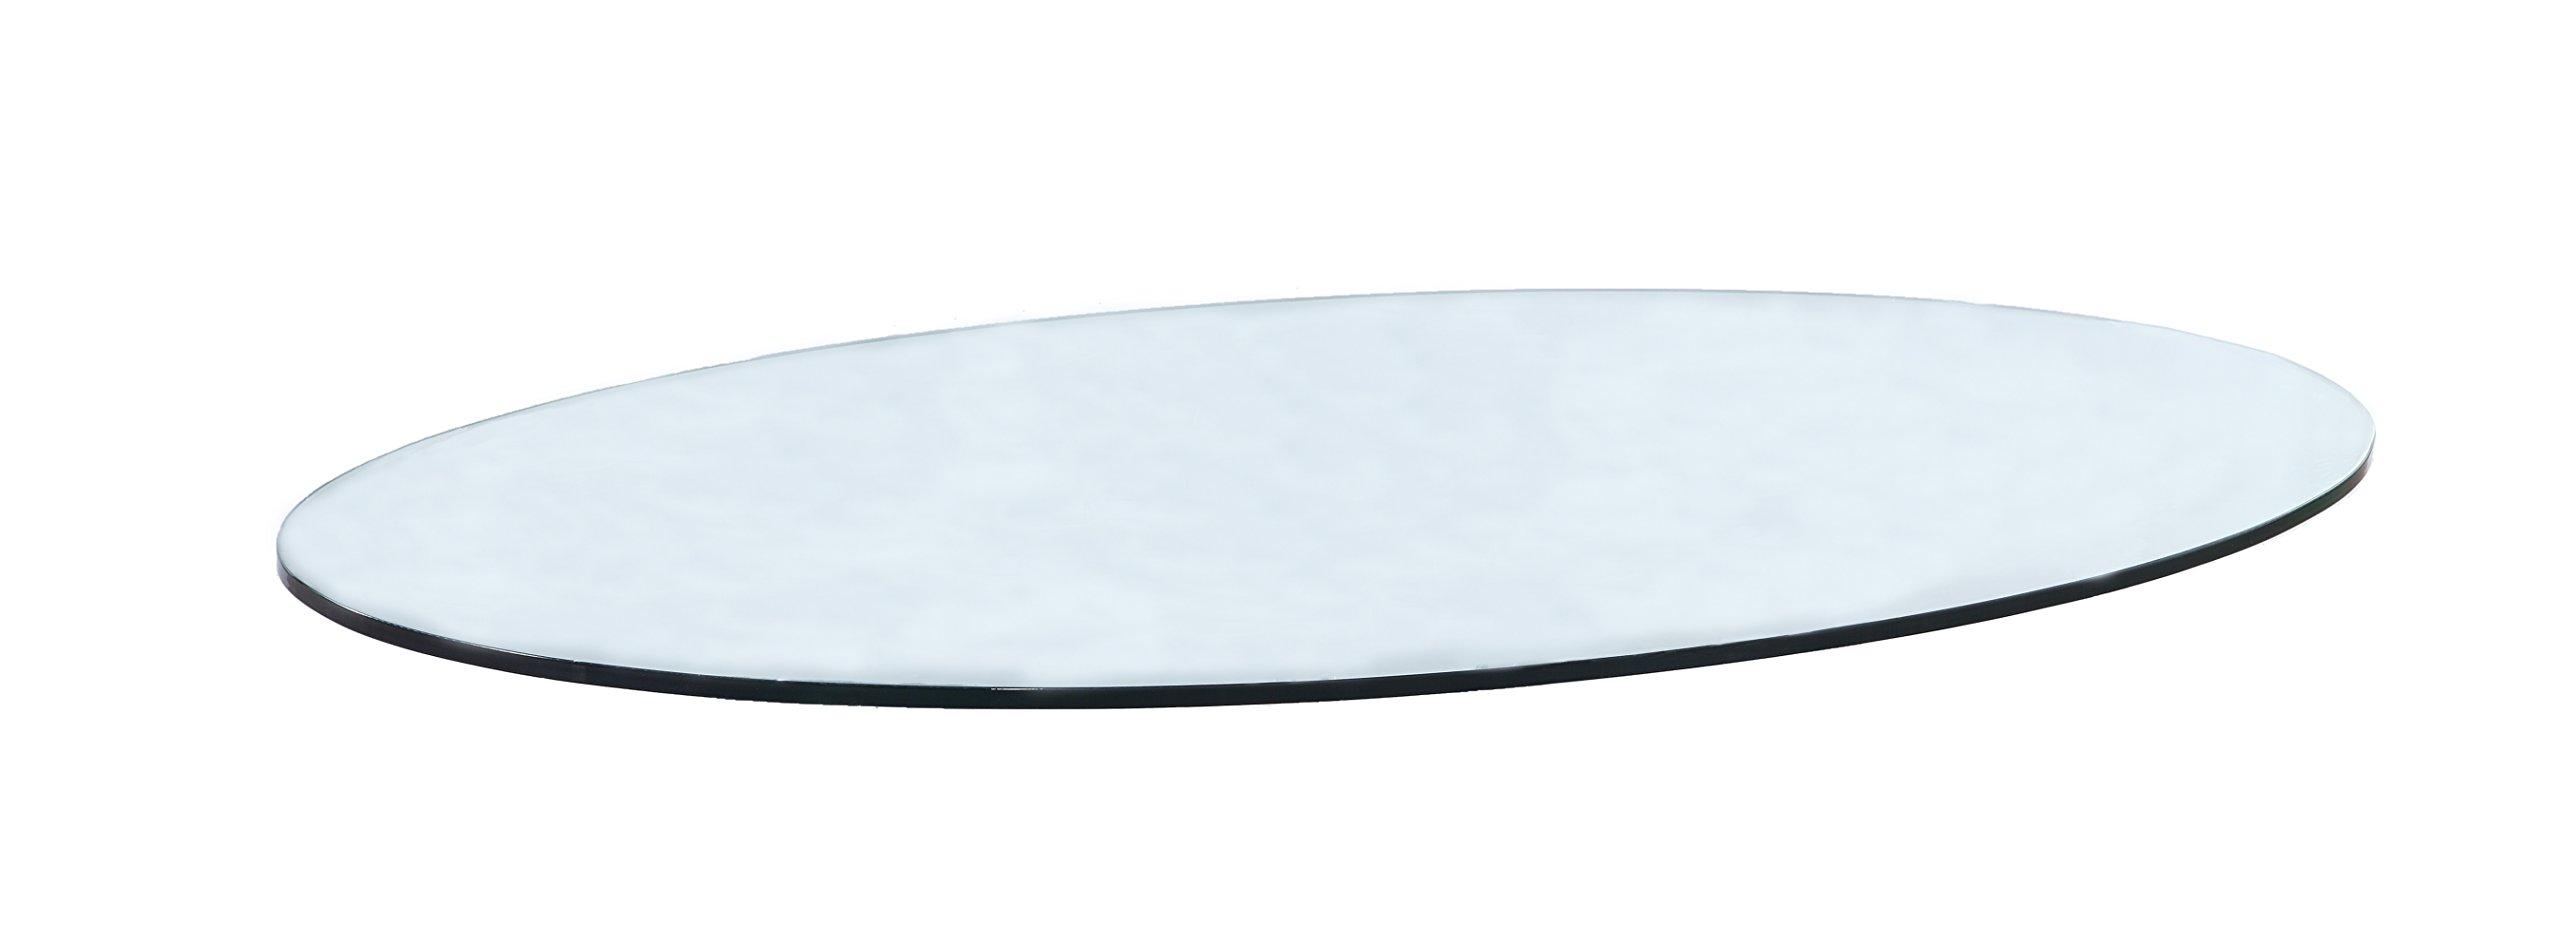 Milan OV305412FECT Table Top, 30'' x 54'', Clear